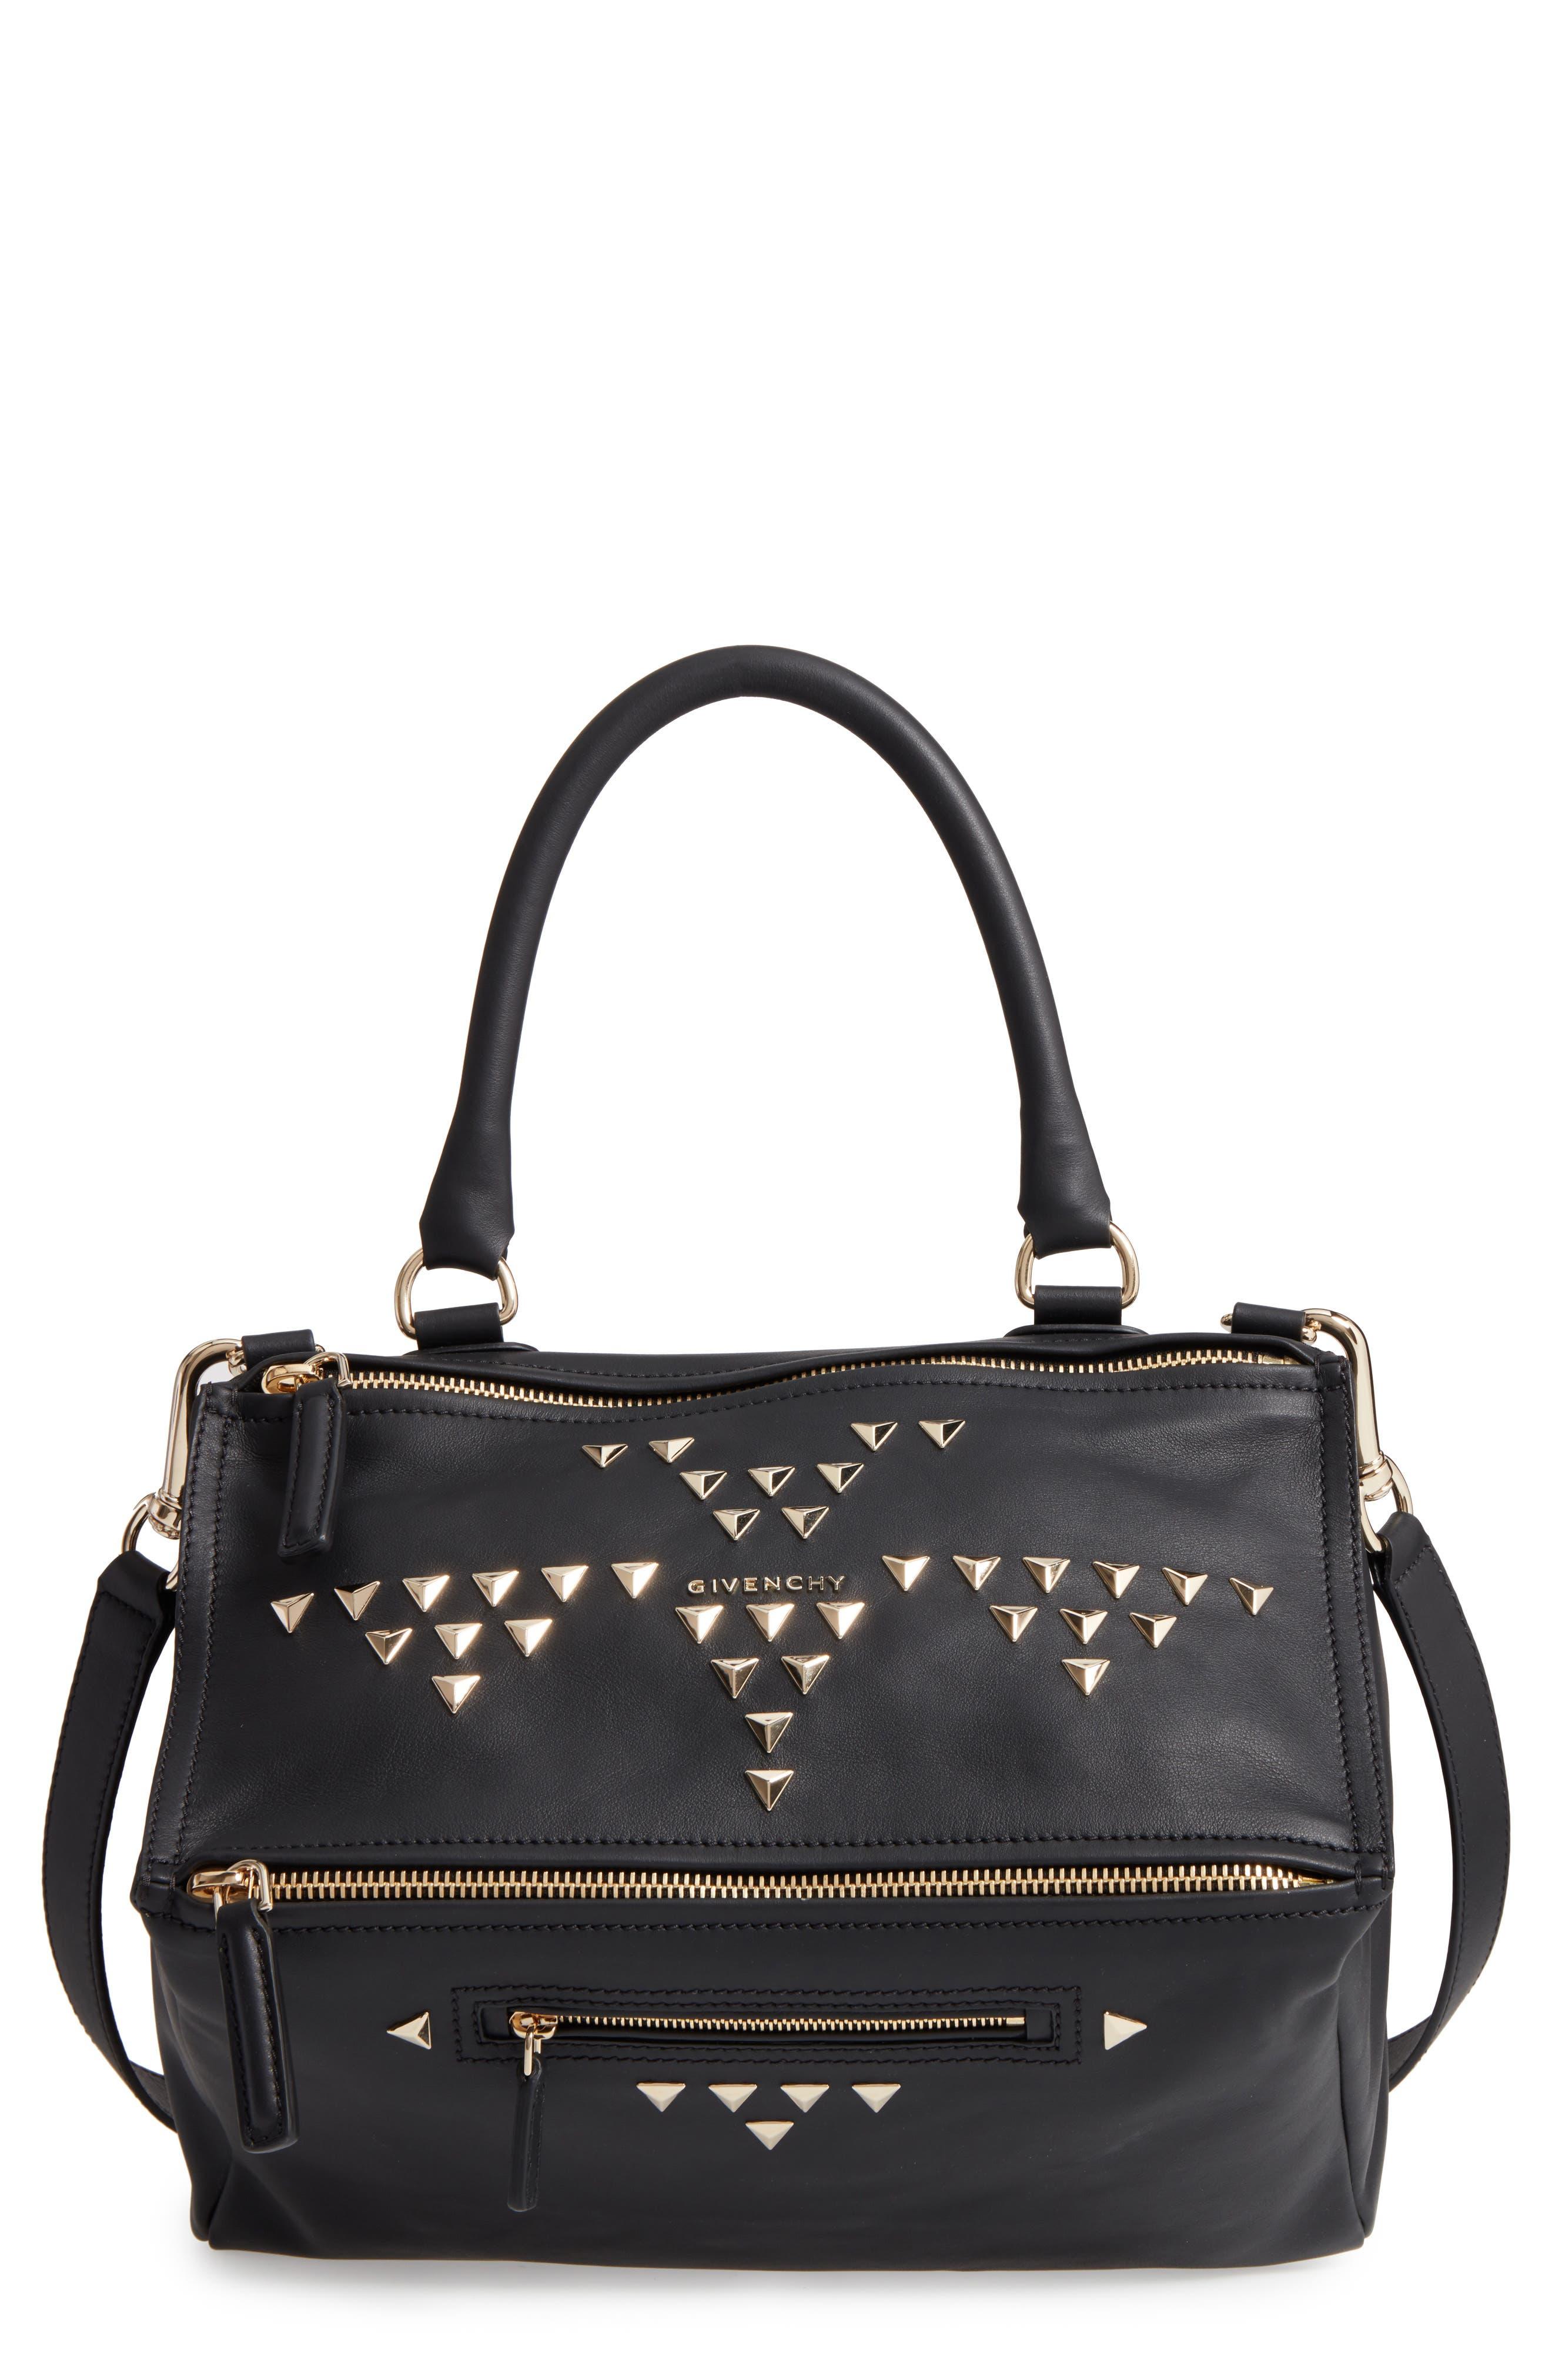 Givenchy Medium Pandora Leather Satchel